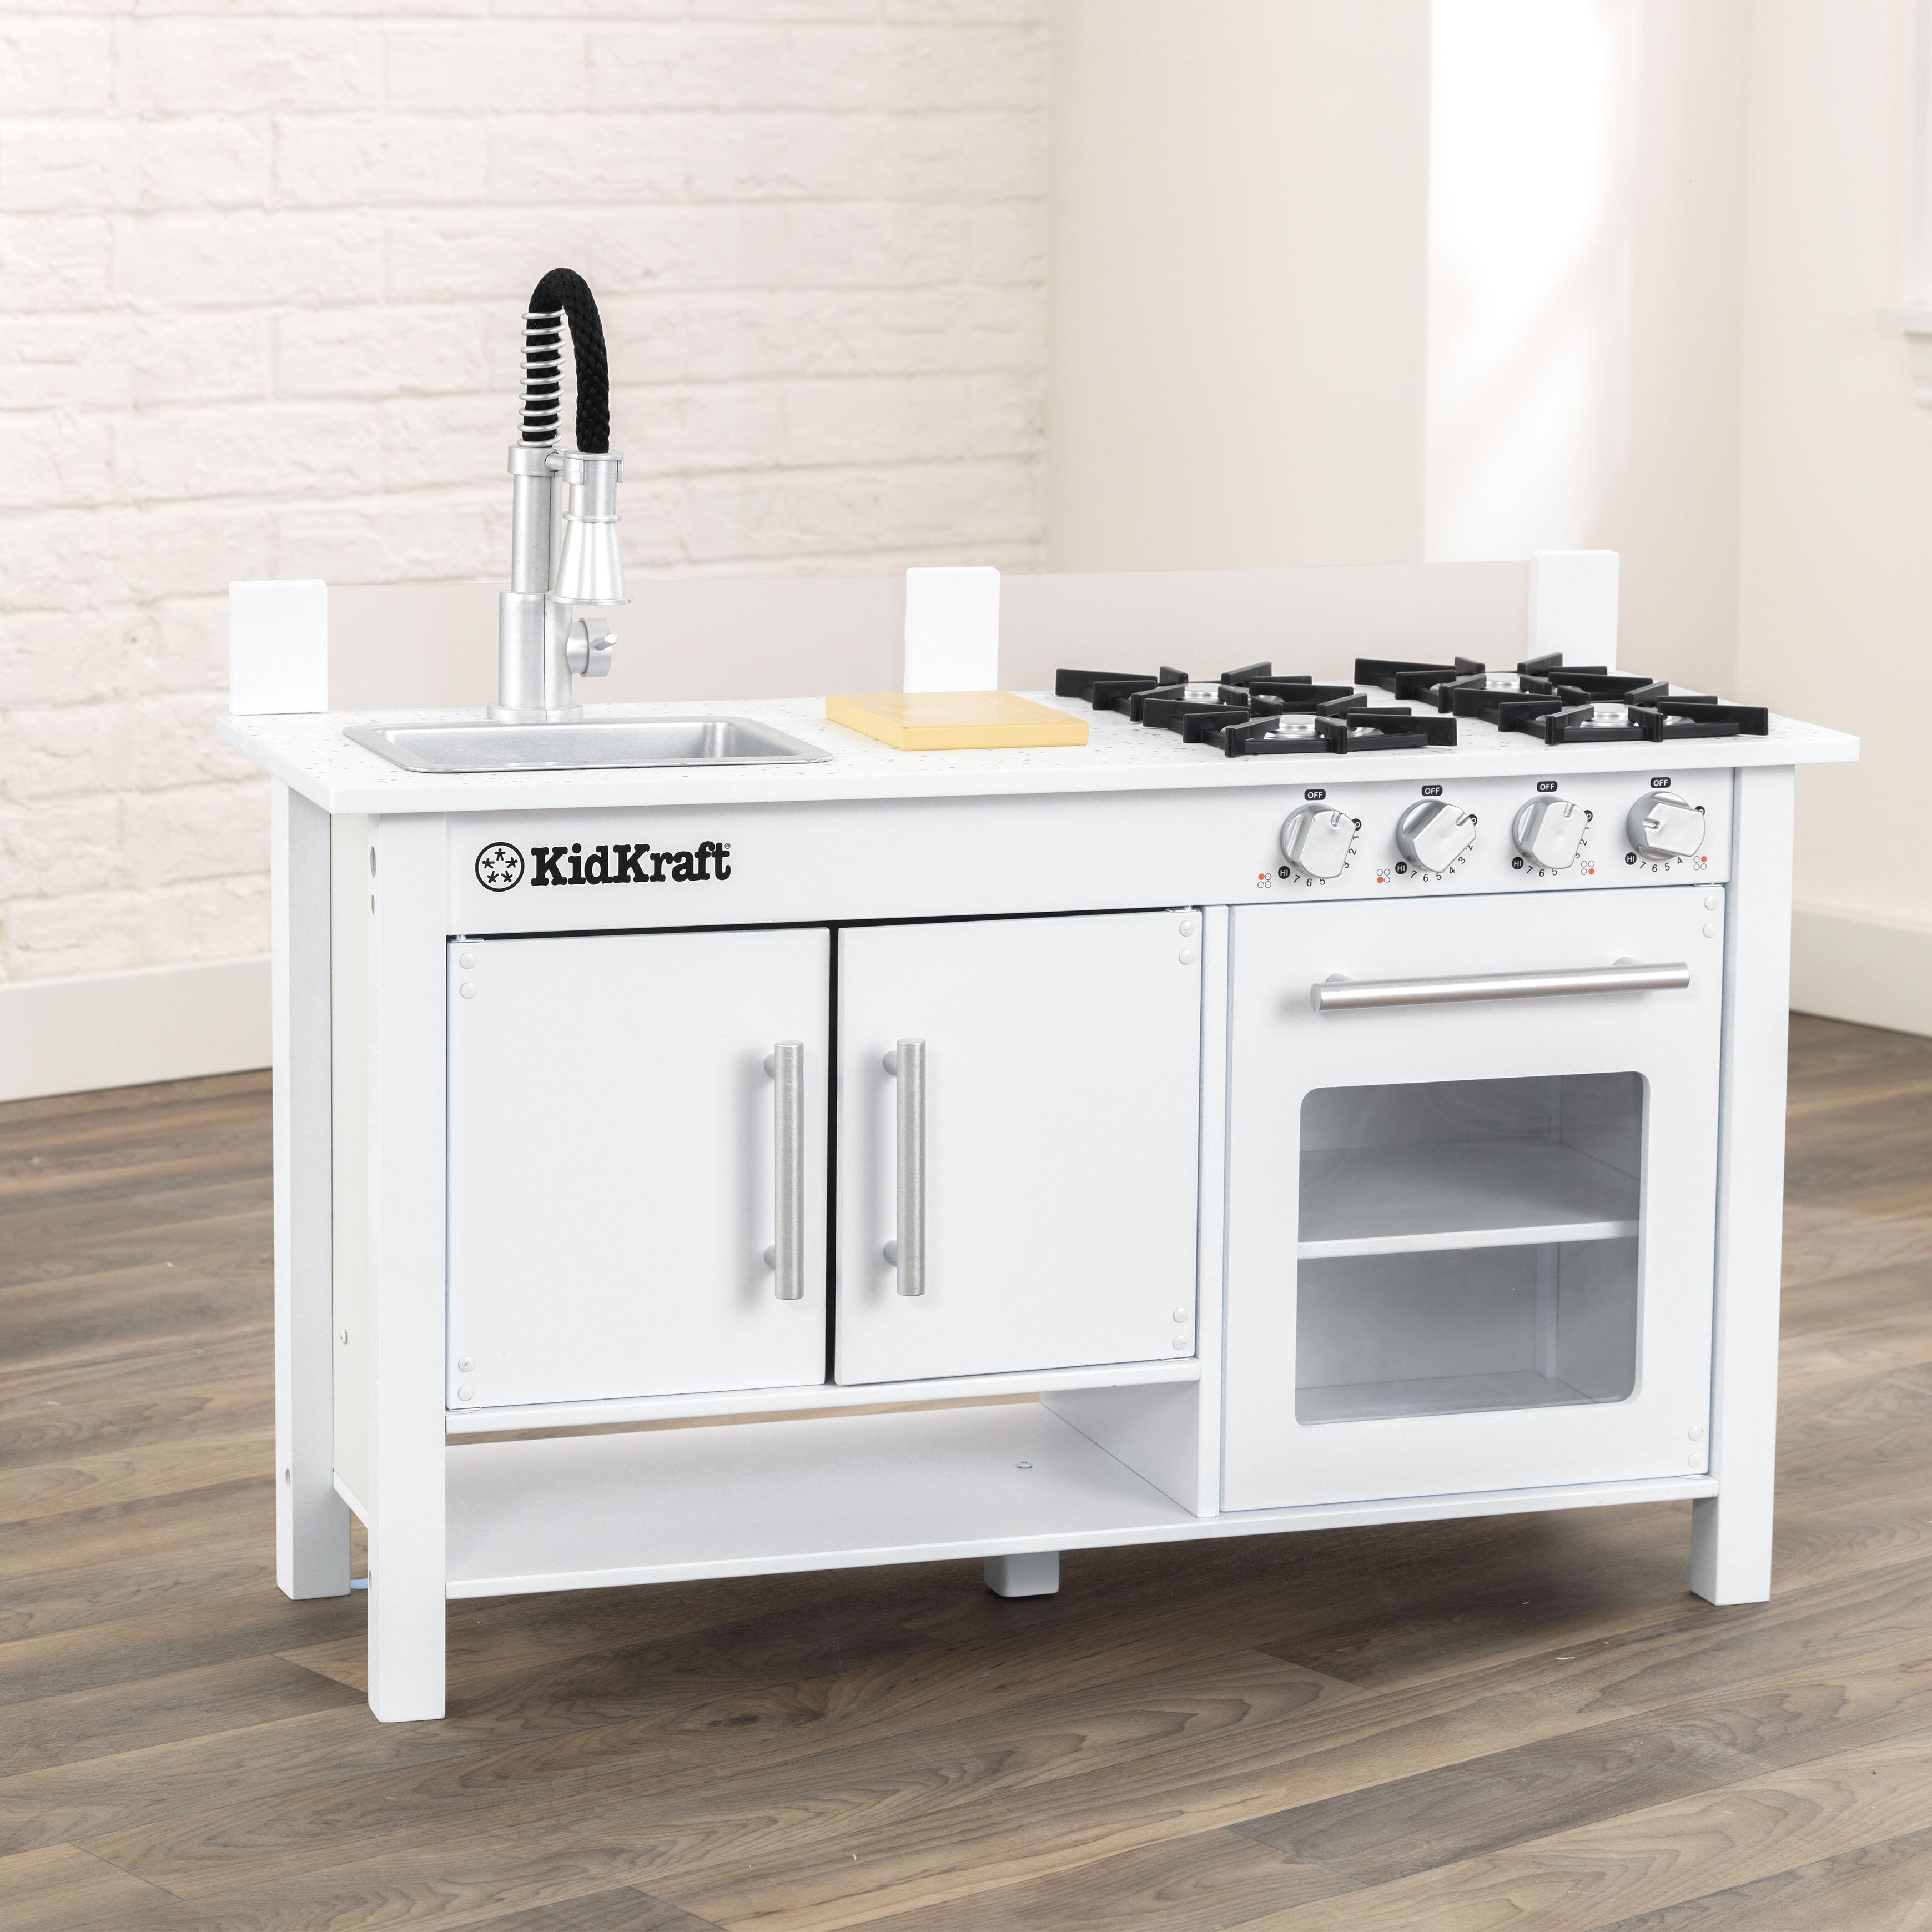 Kidkraft Little Cook S Work Station Kitchen Set Reviews Wayfair